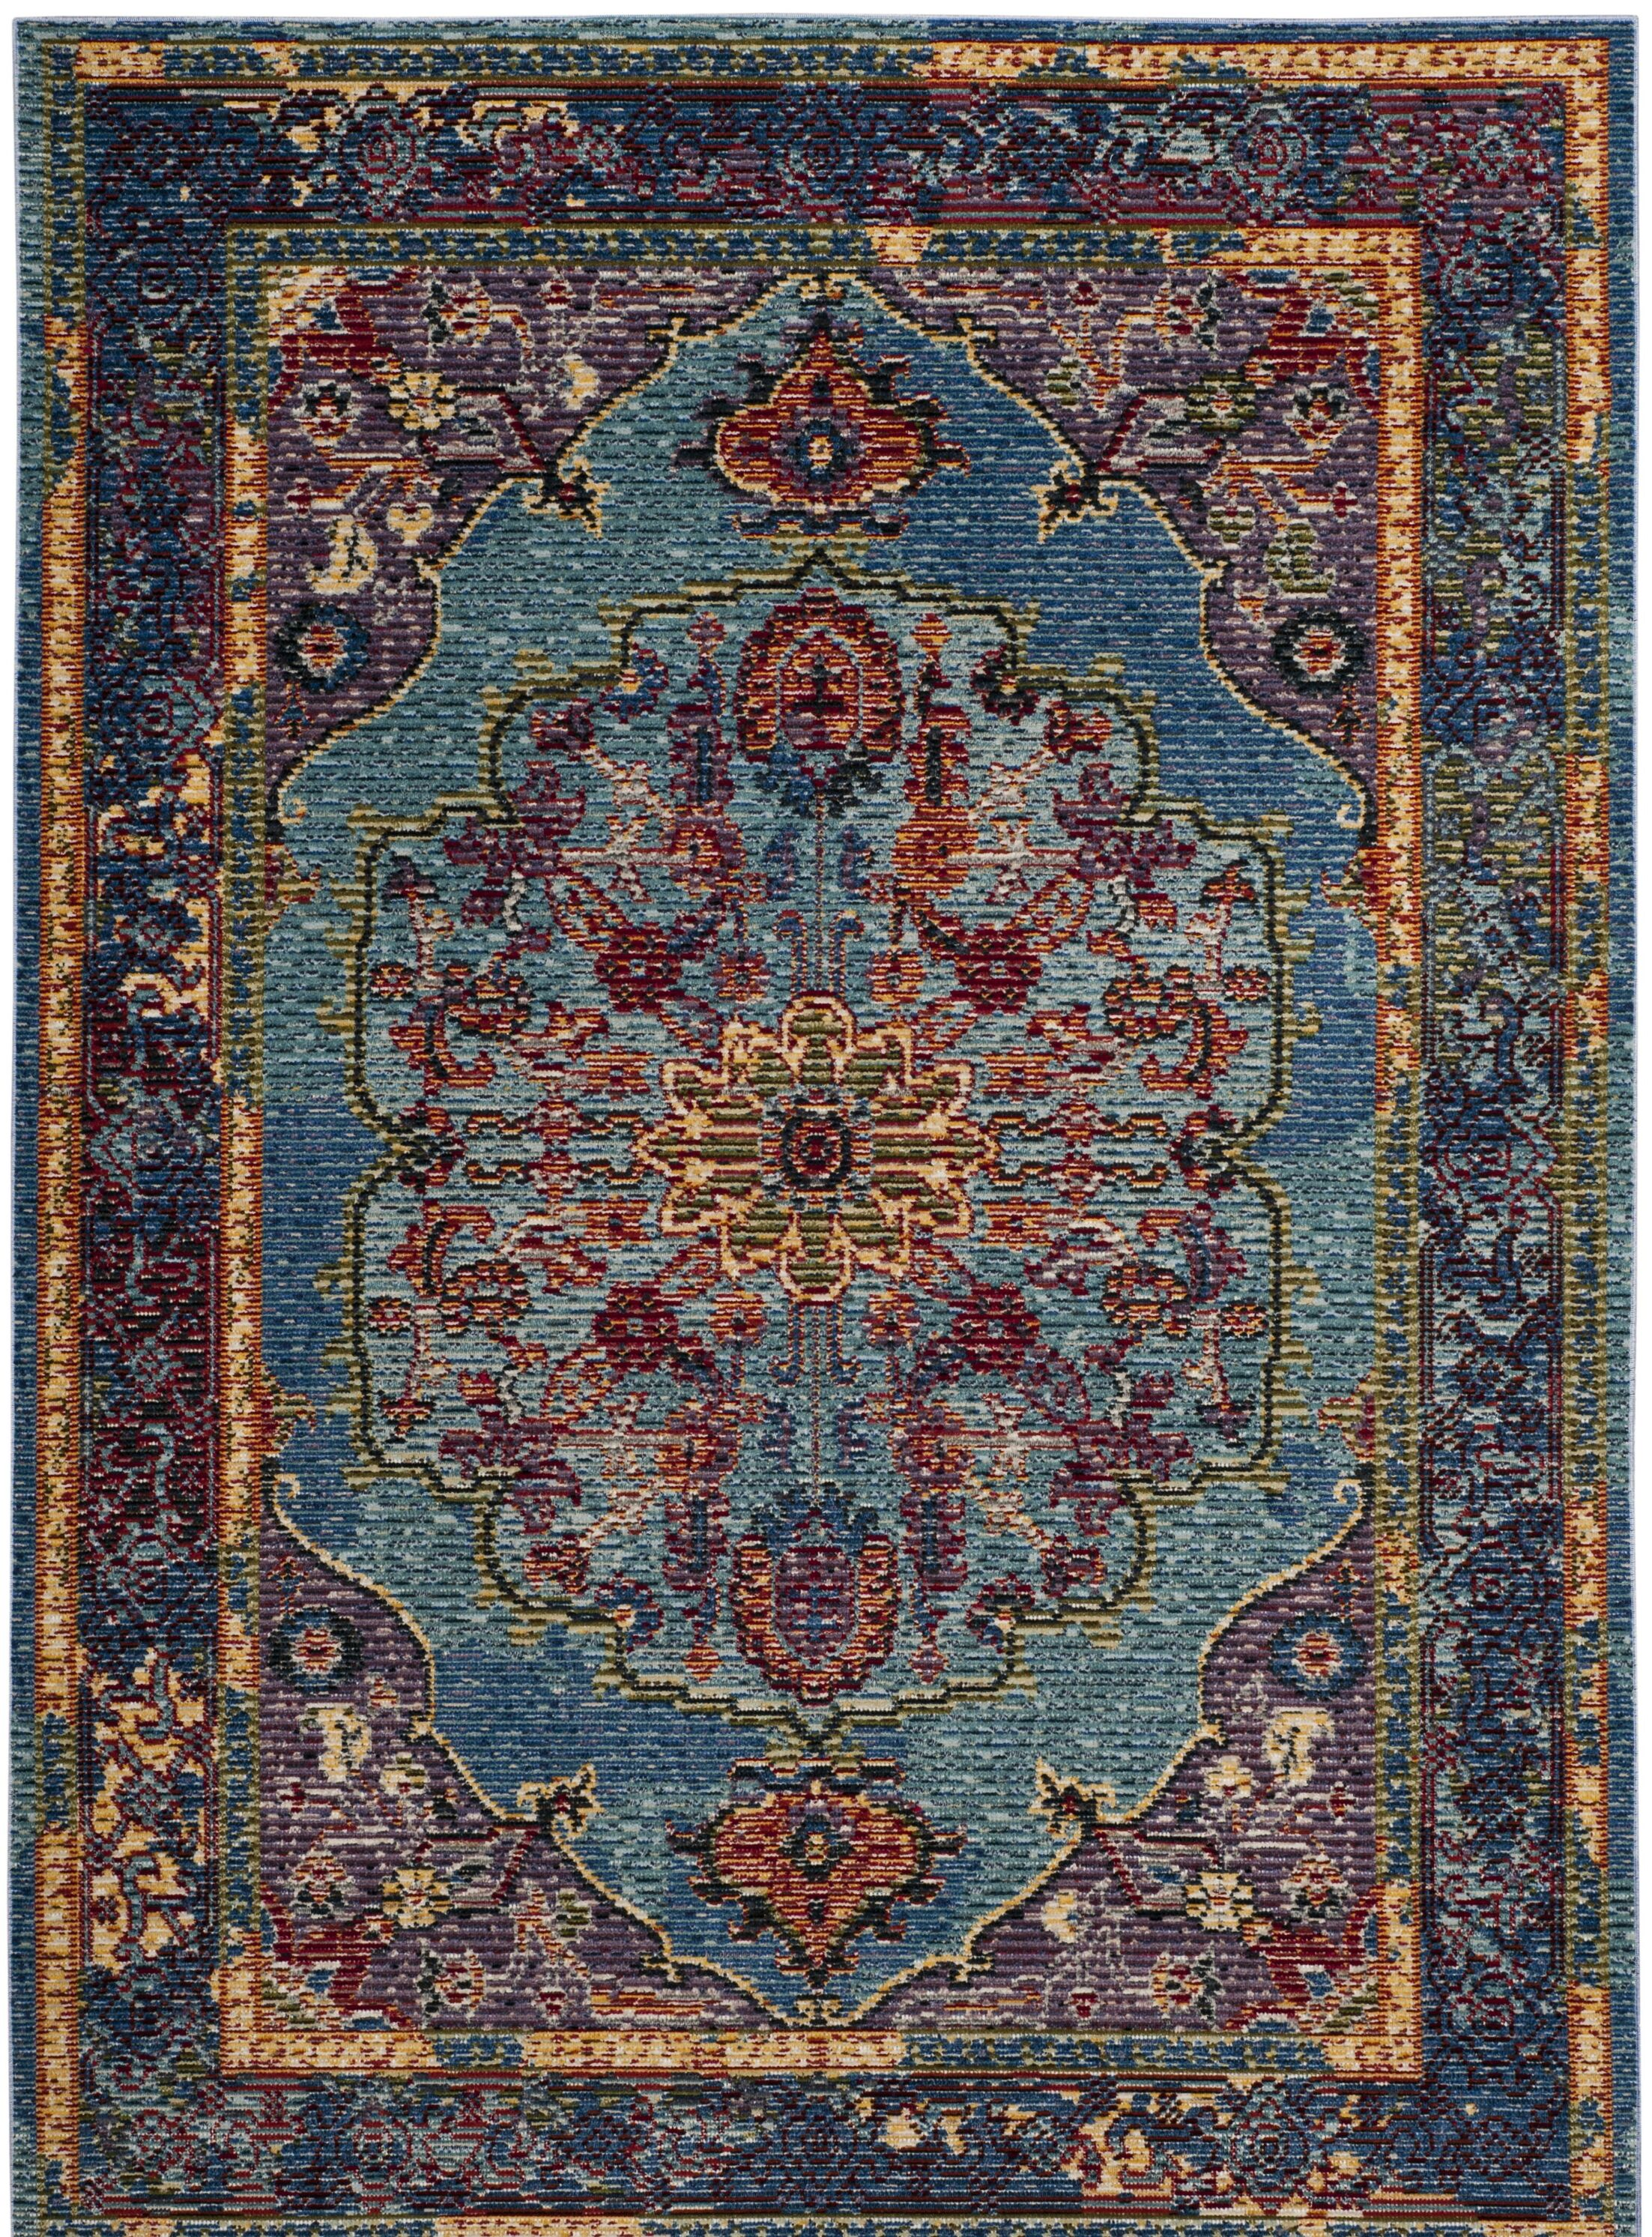 Skye Blue/Purple Area Rug Rug Size: Rectangle 4' x 6'